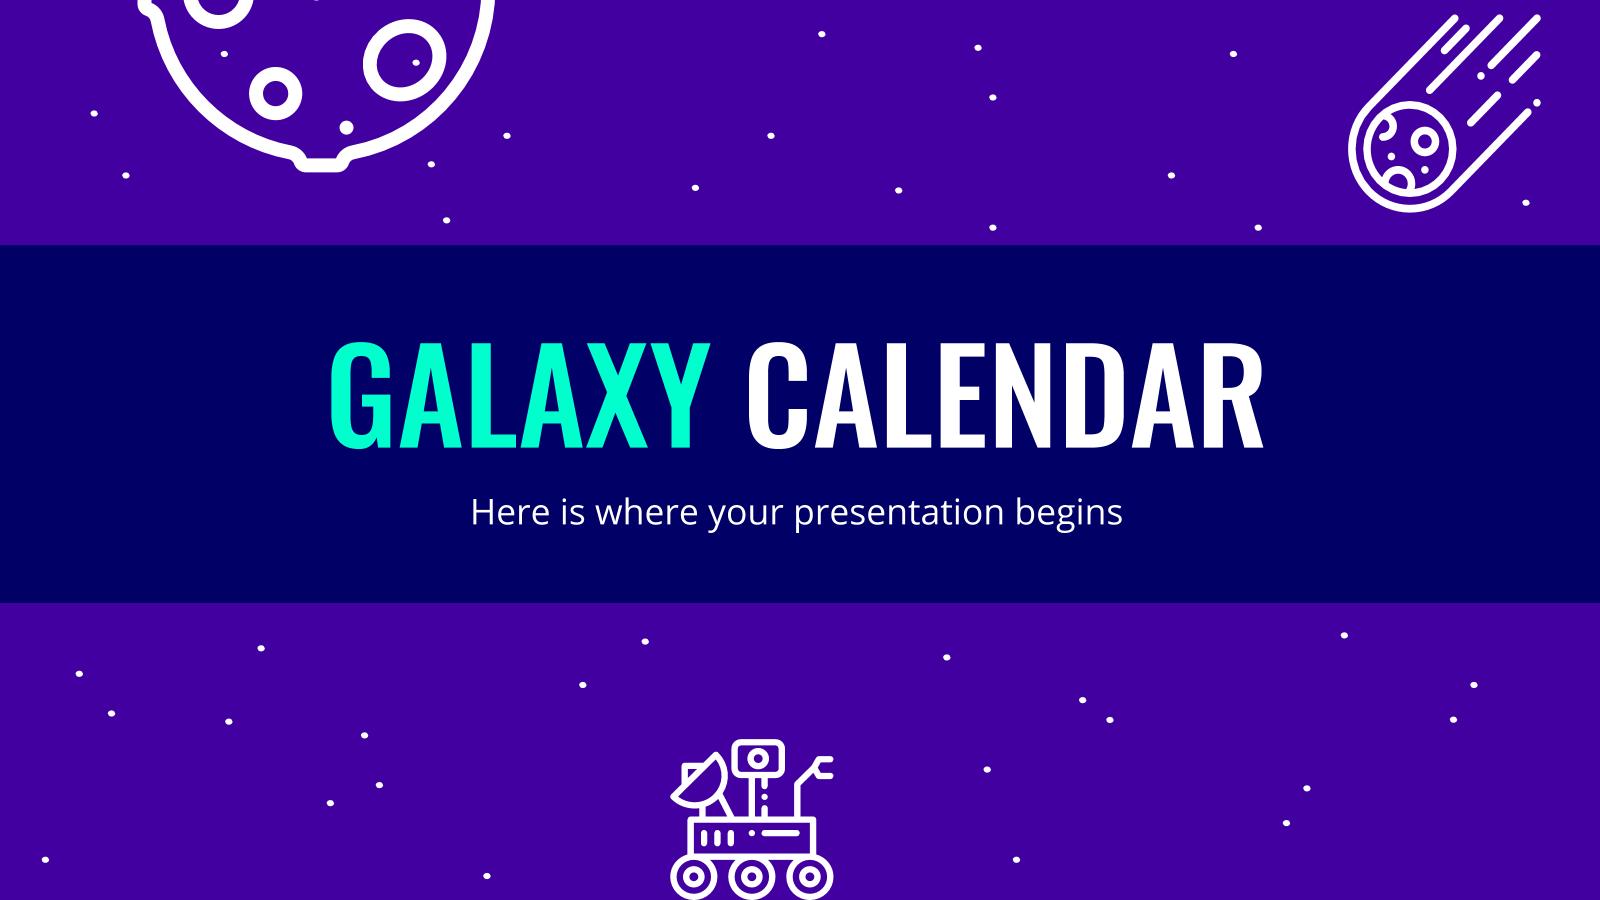 Plantilla de presentación Calendario galáctico